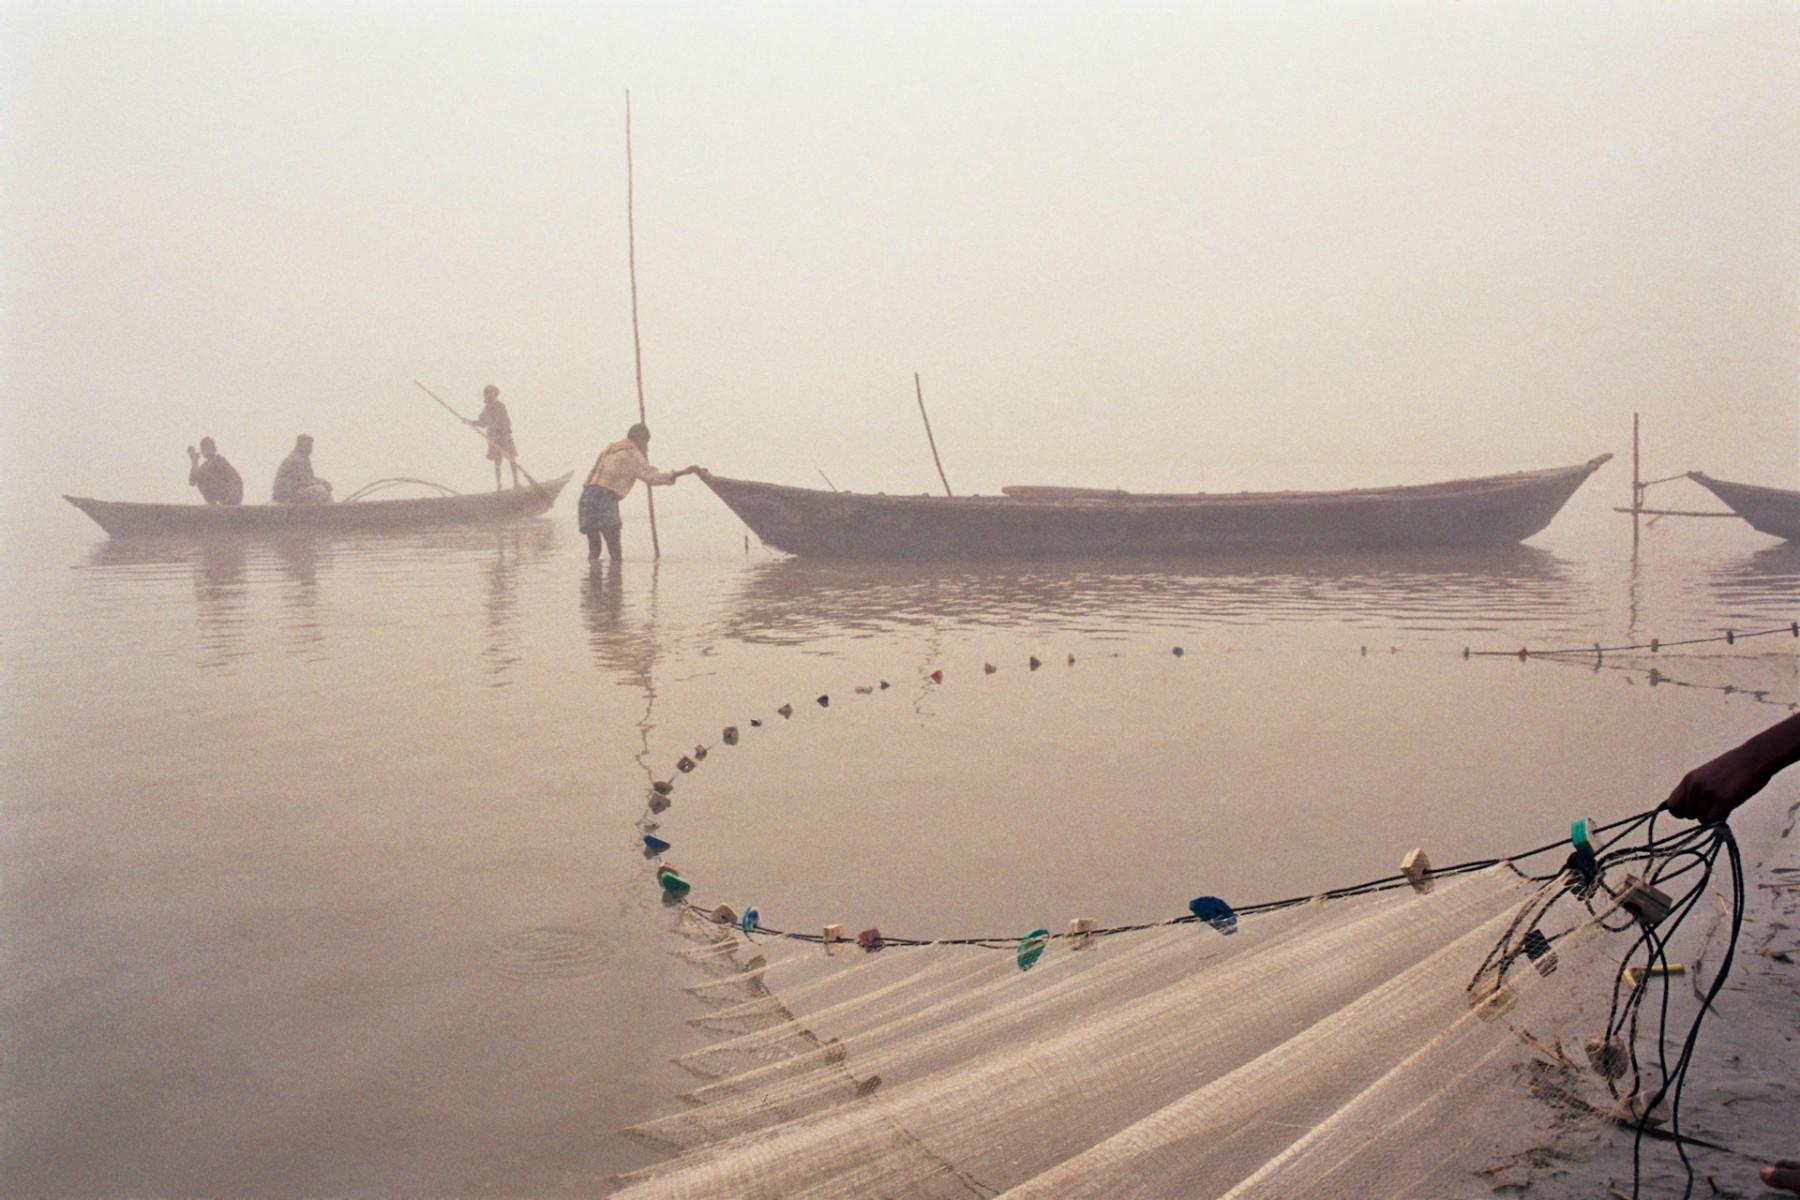 Fisherman Sonepur Mela